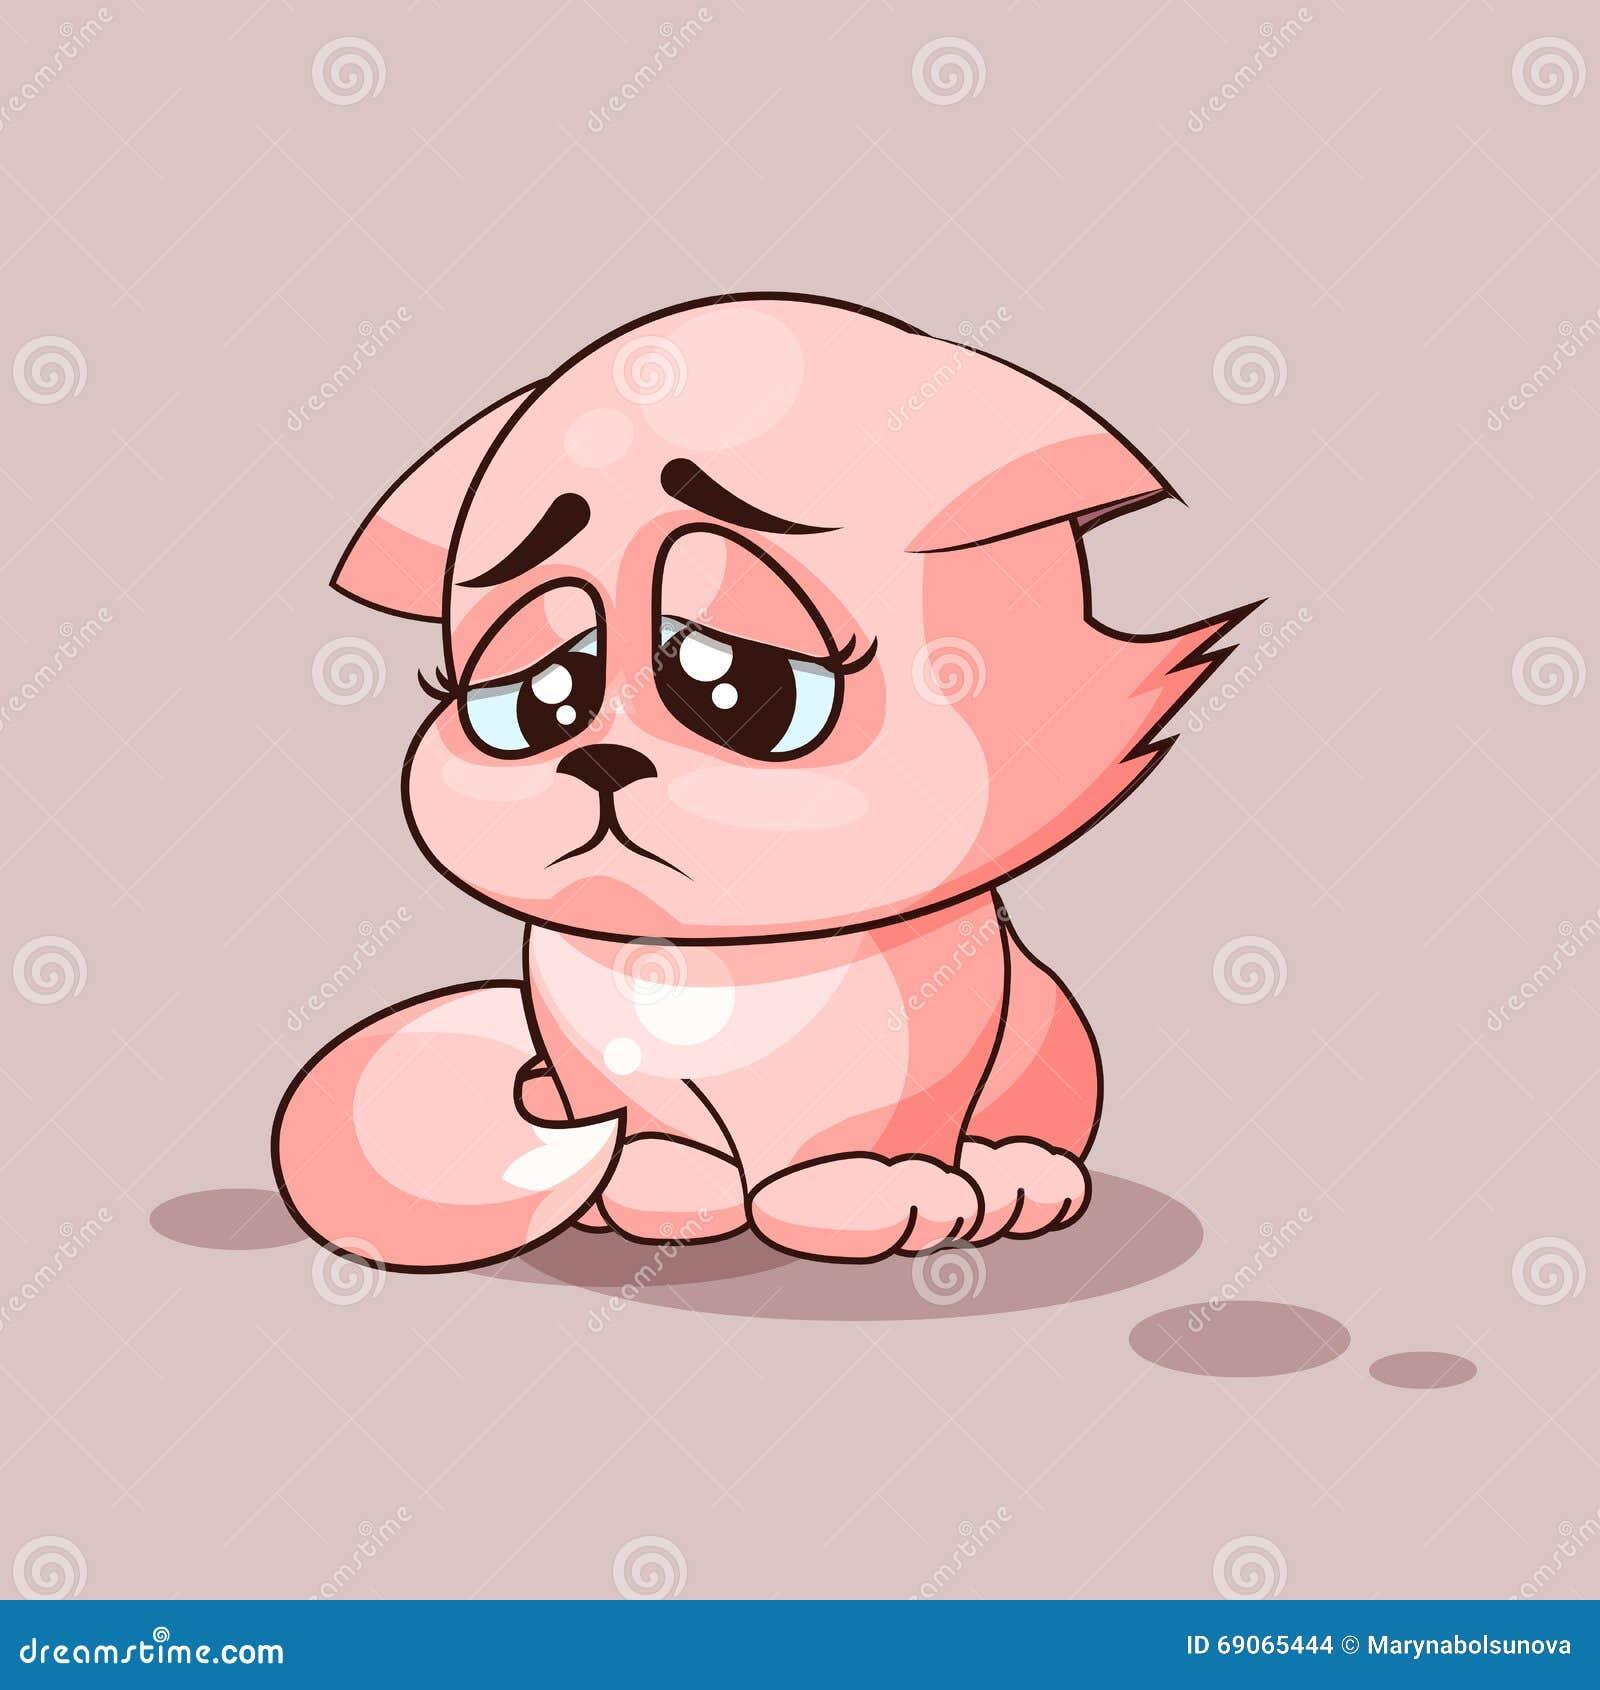 Vector Stock Illustration Emoji character cartoon cat sad and ...